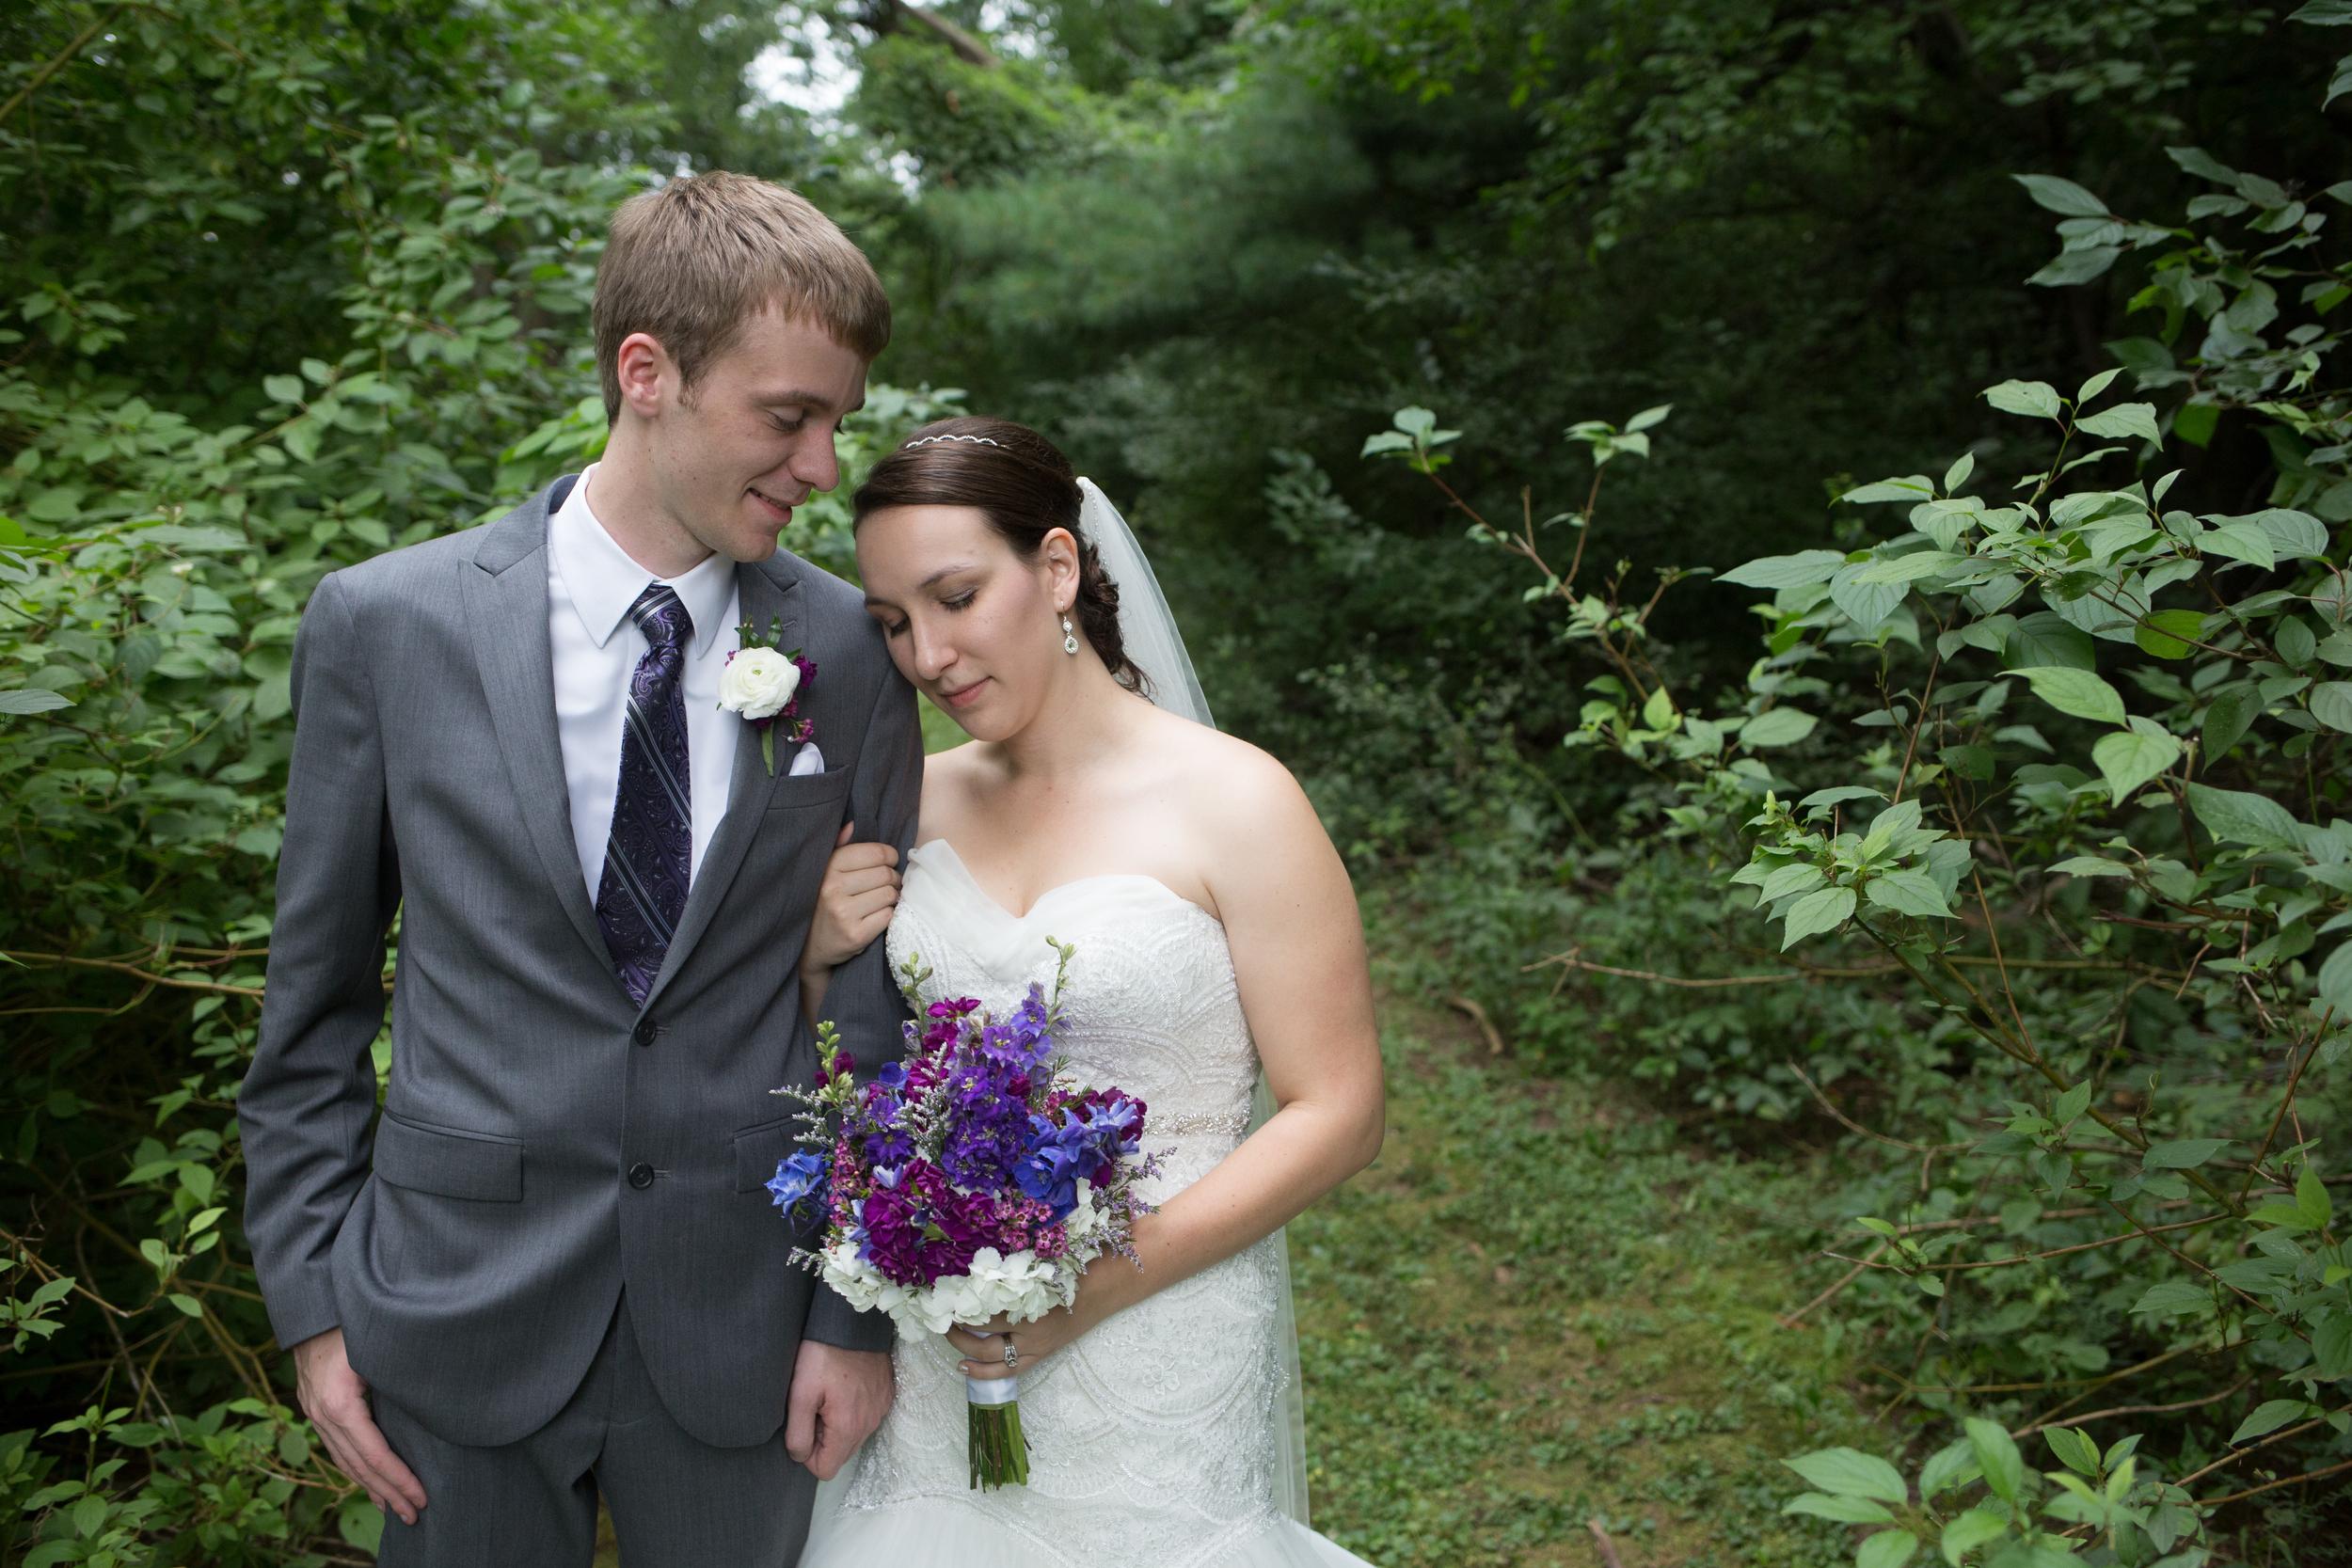 Appleton Wisconsin Wedding Photographer -Whit Meza Photography